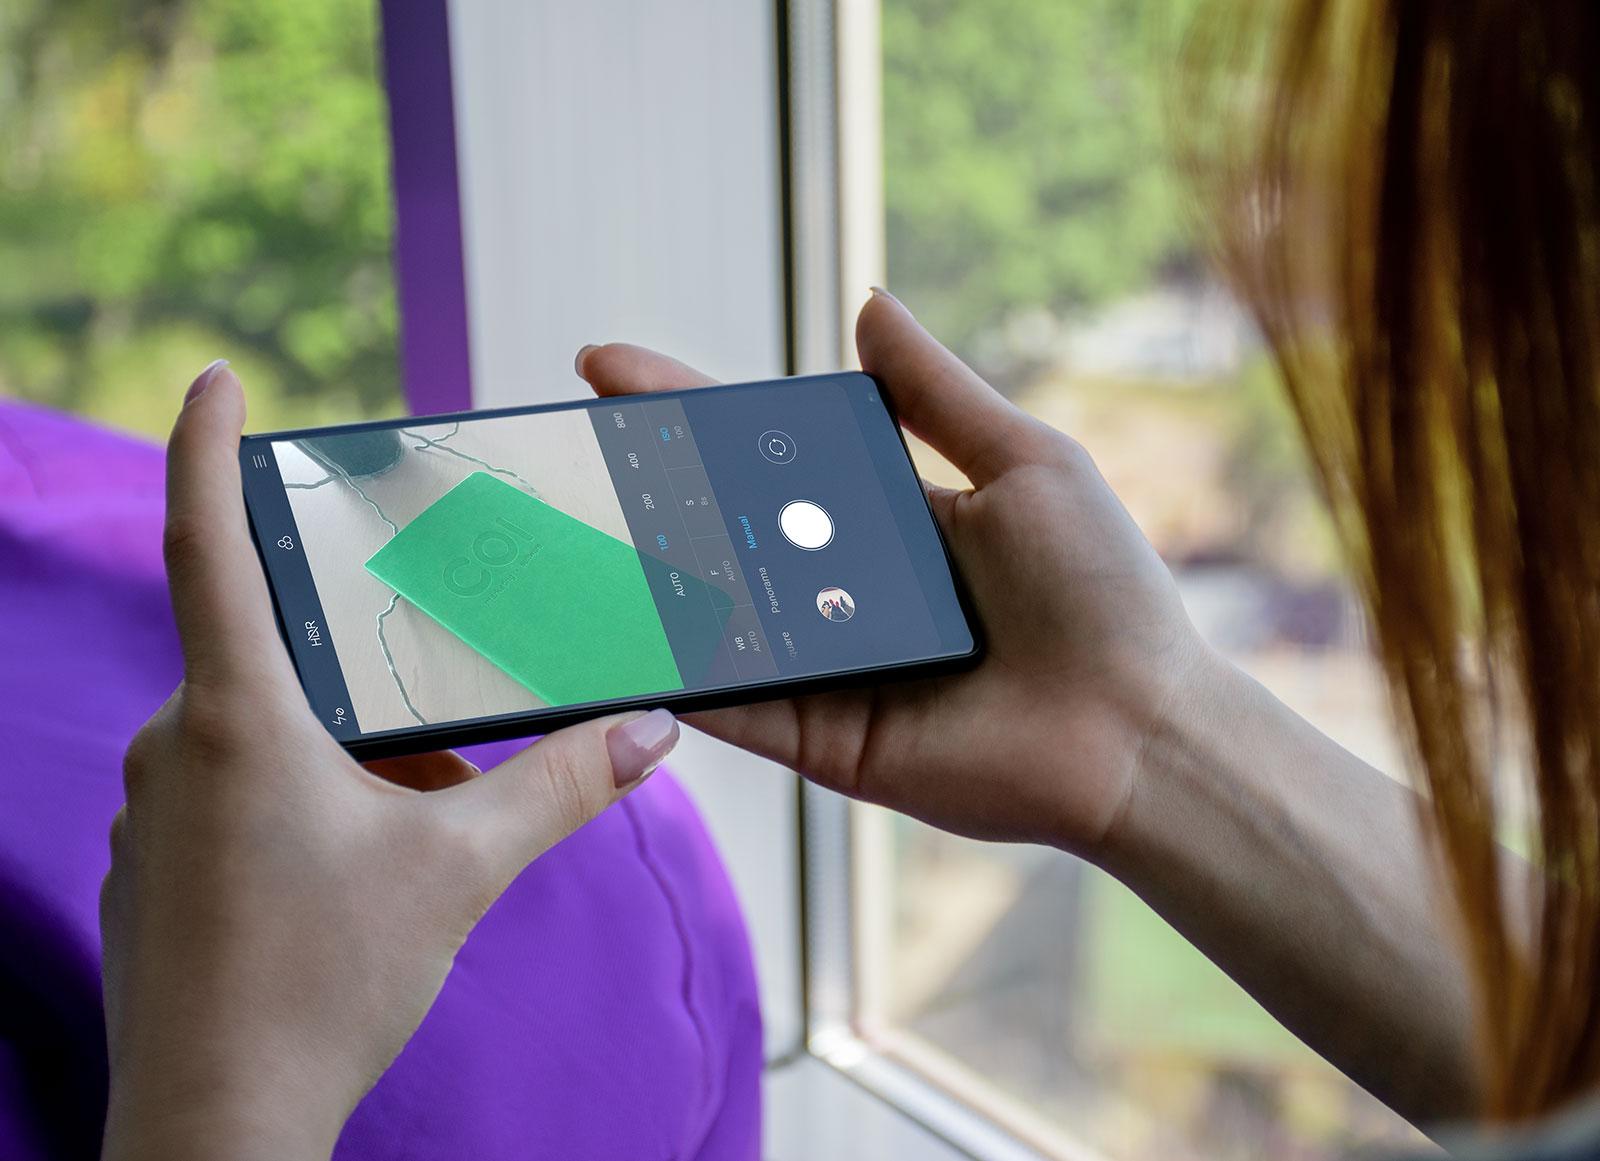 Free-Xiaomi-Mi-Mix-2-Mobile-Phone-in-Female-Hand-Mockup-PSD-3